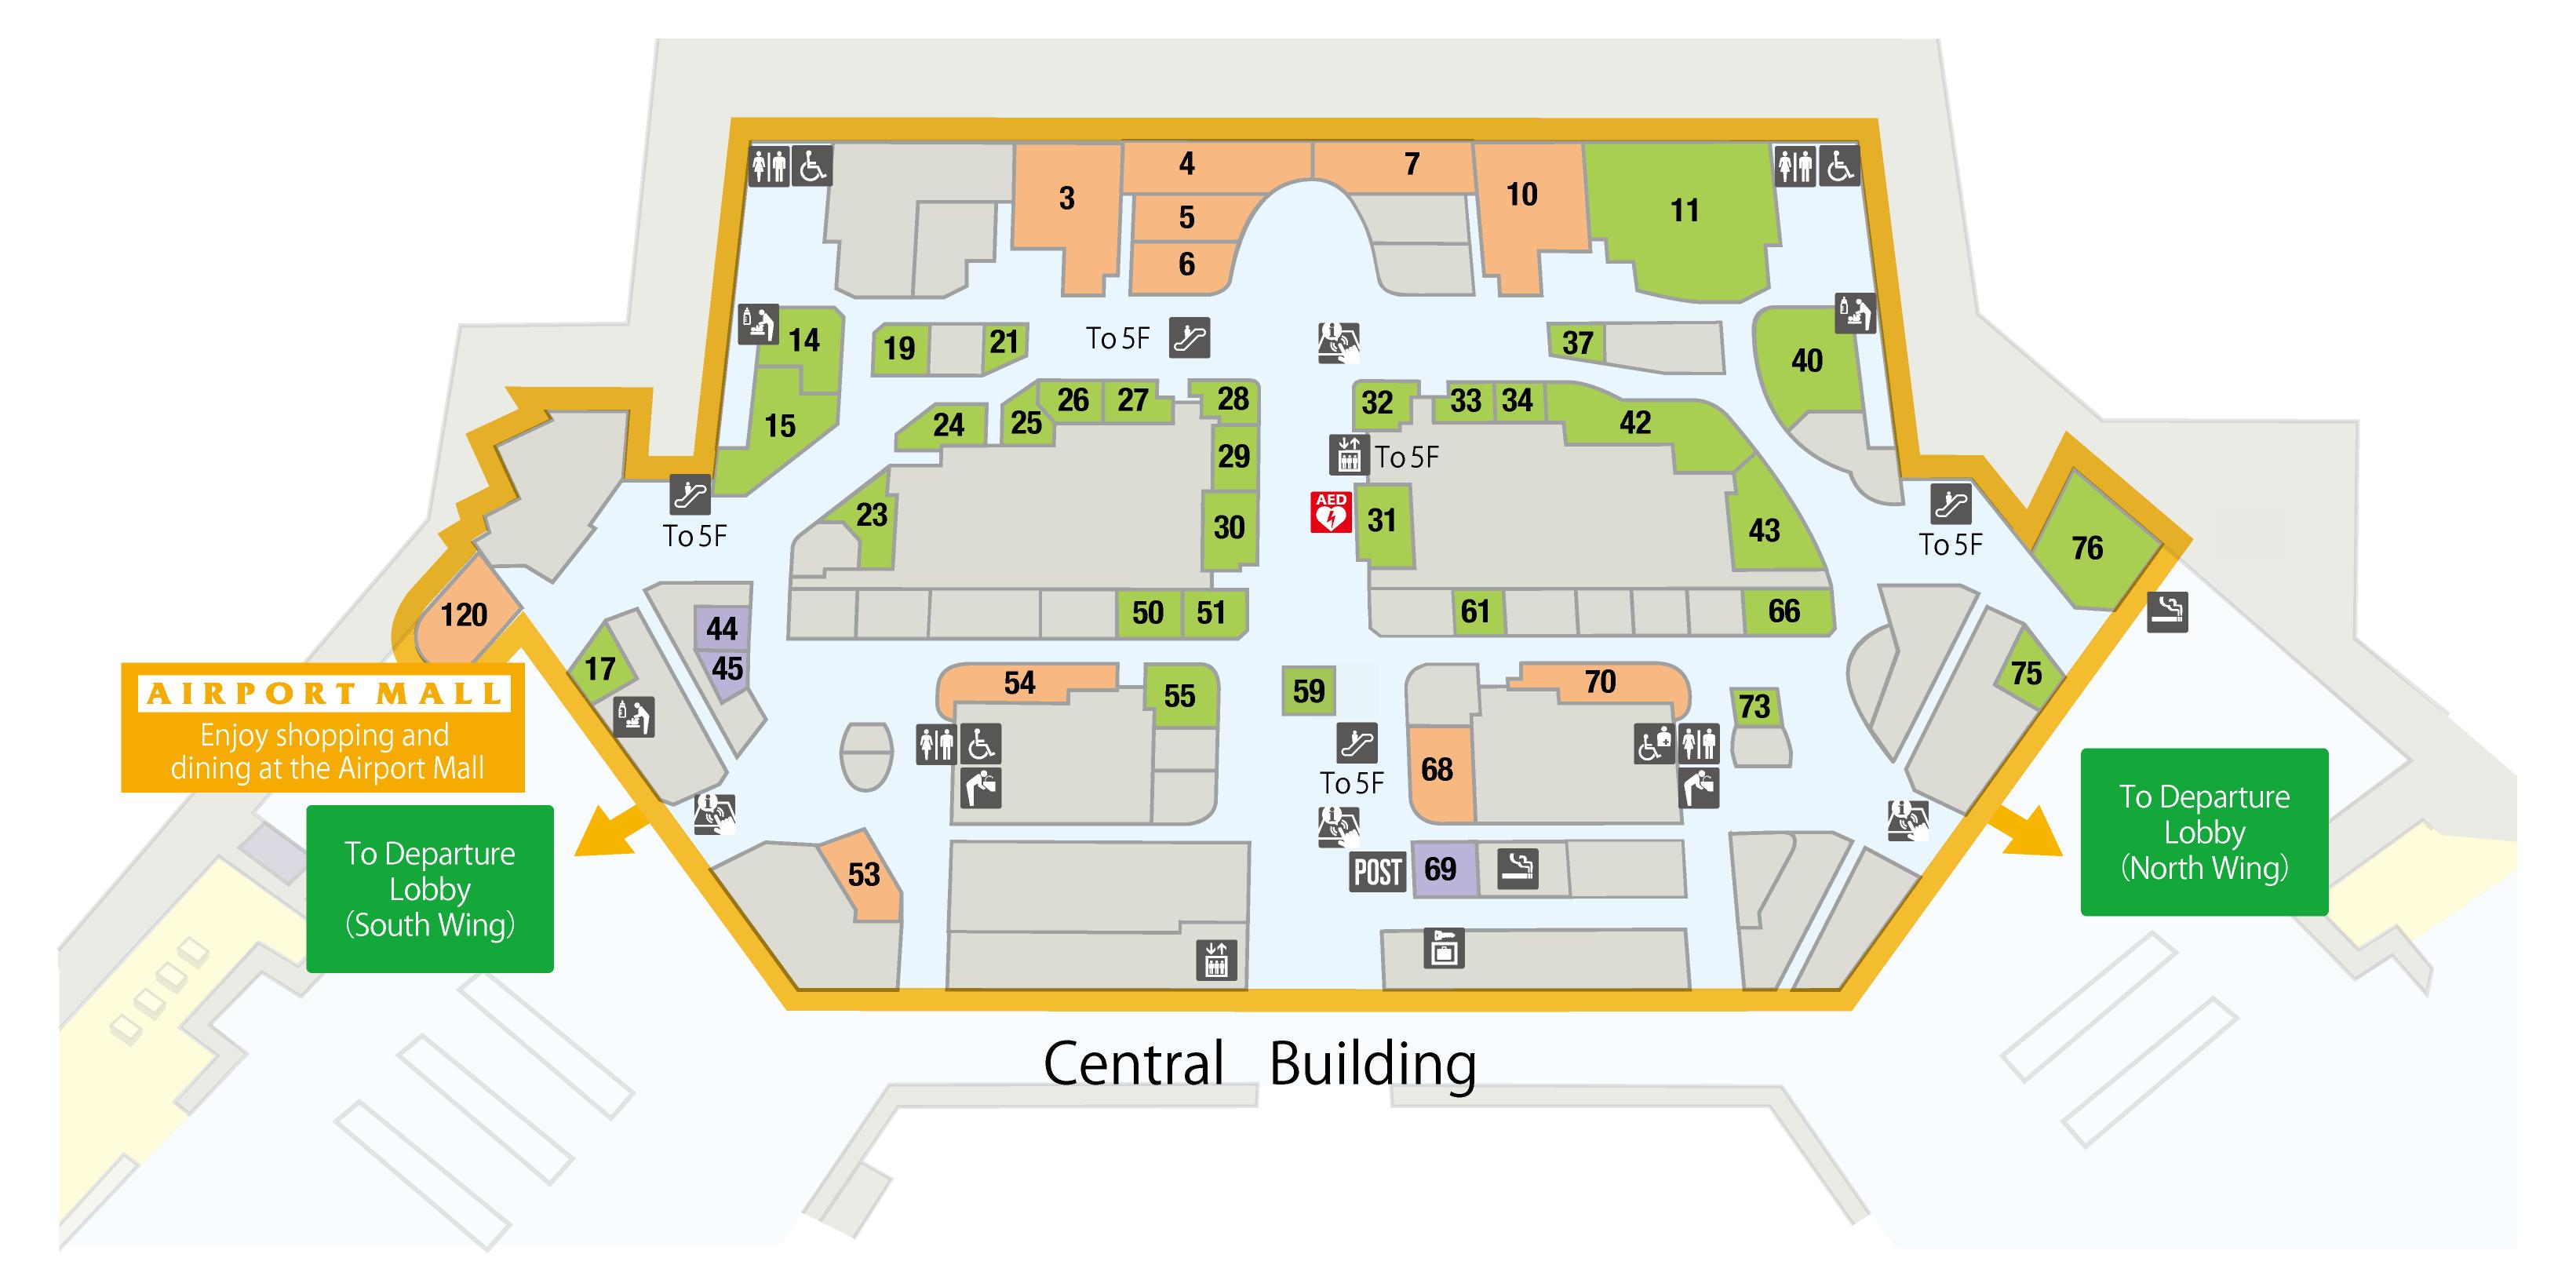 Airport floor plan design thefloors co for Floor map design